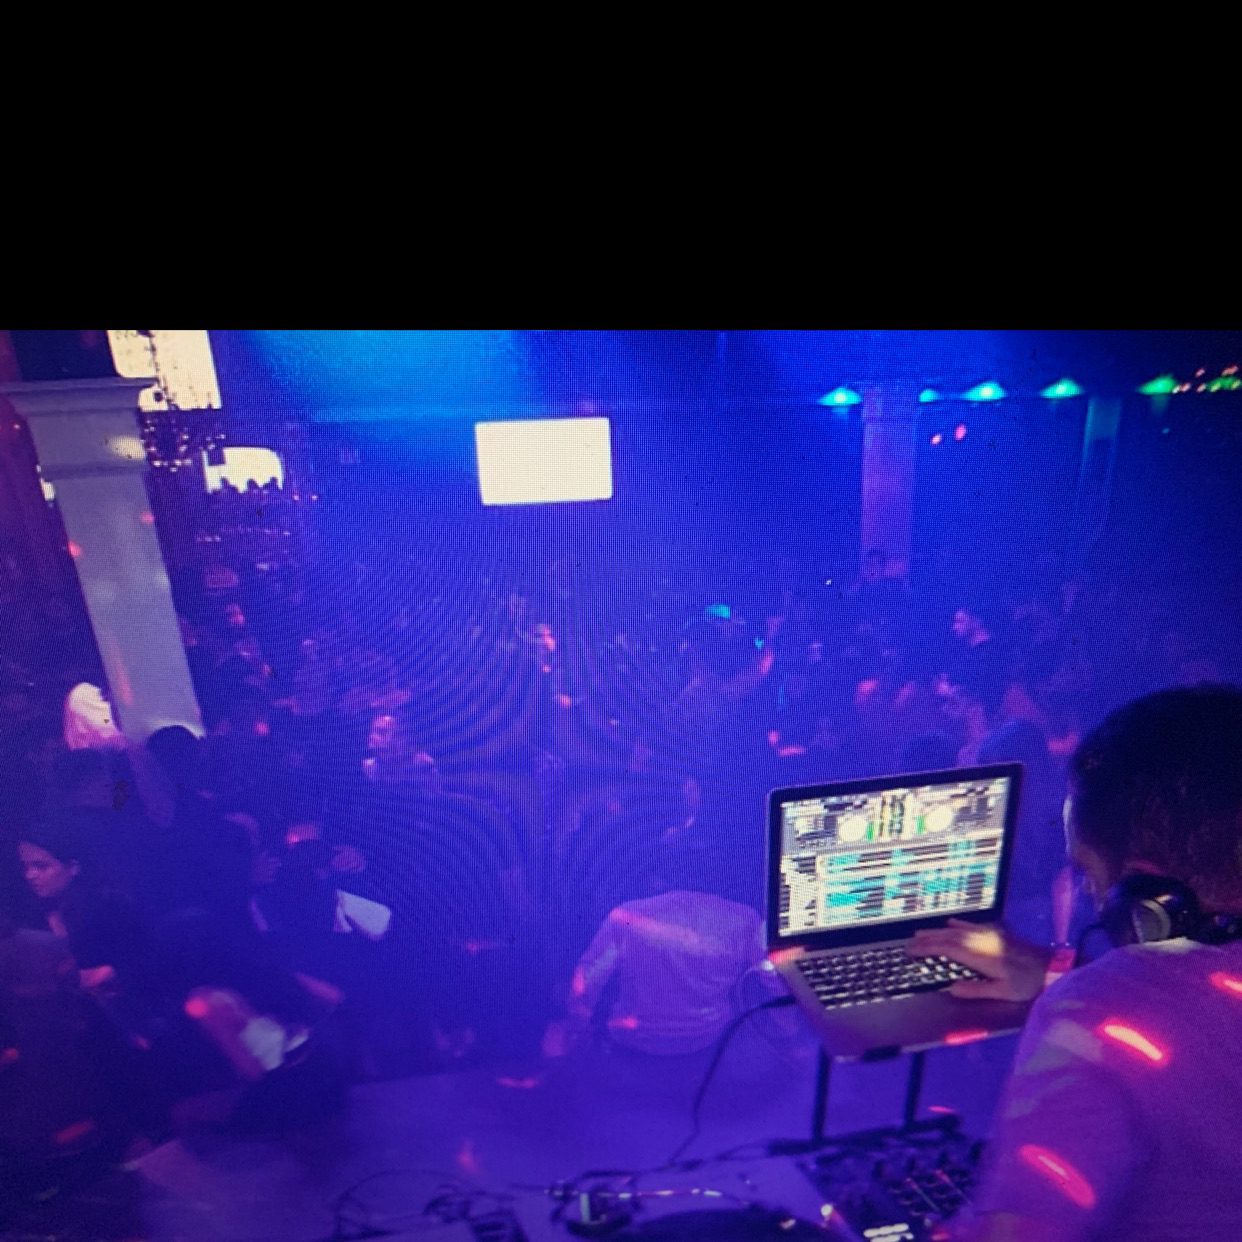 Aurea Vista Night Club and Bar.